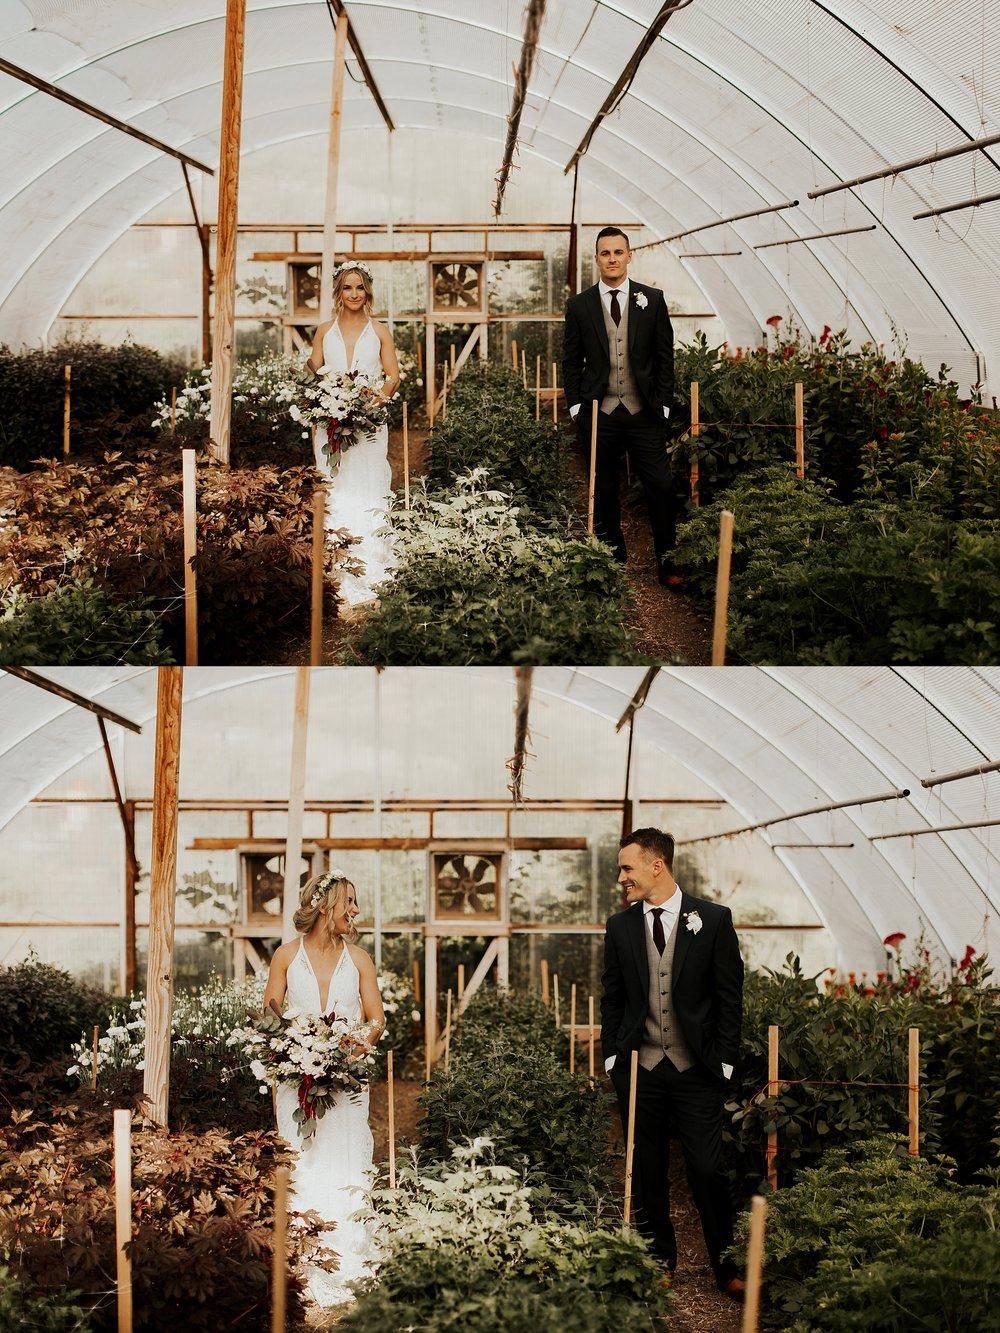 Lyons_Farmette_Wedding_Denver_Colorado_wedding064.JPG